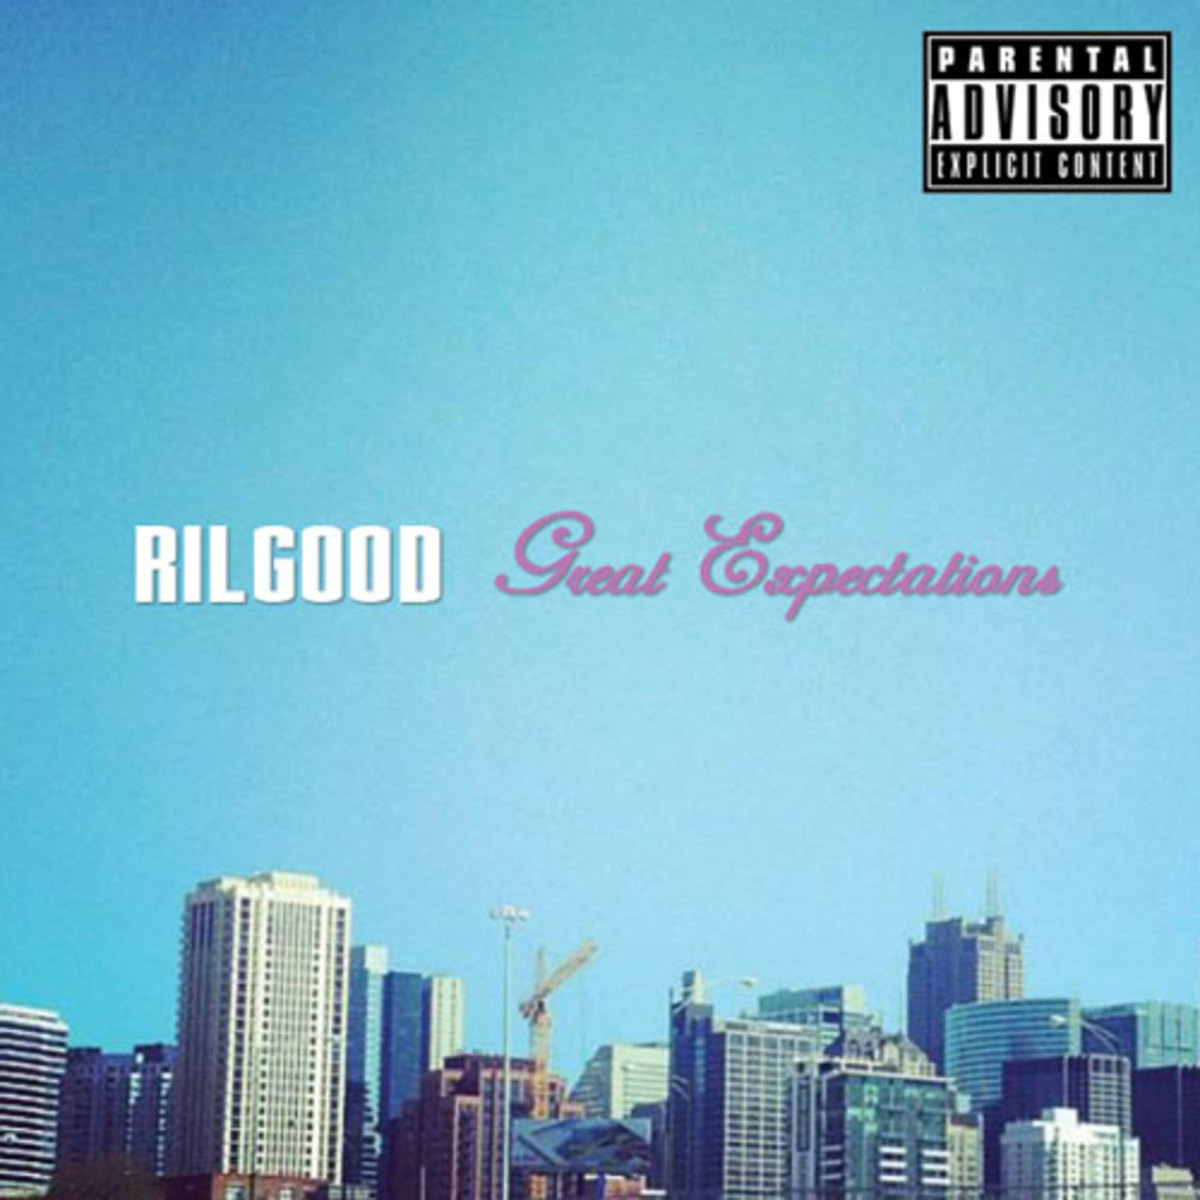 rilgood-greatexpectations.jpg